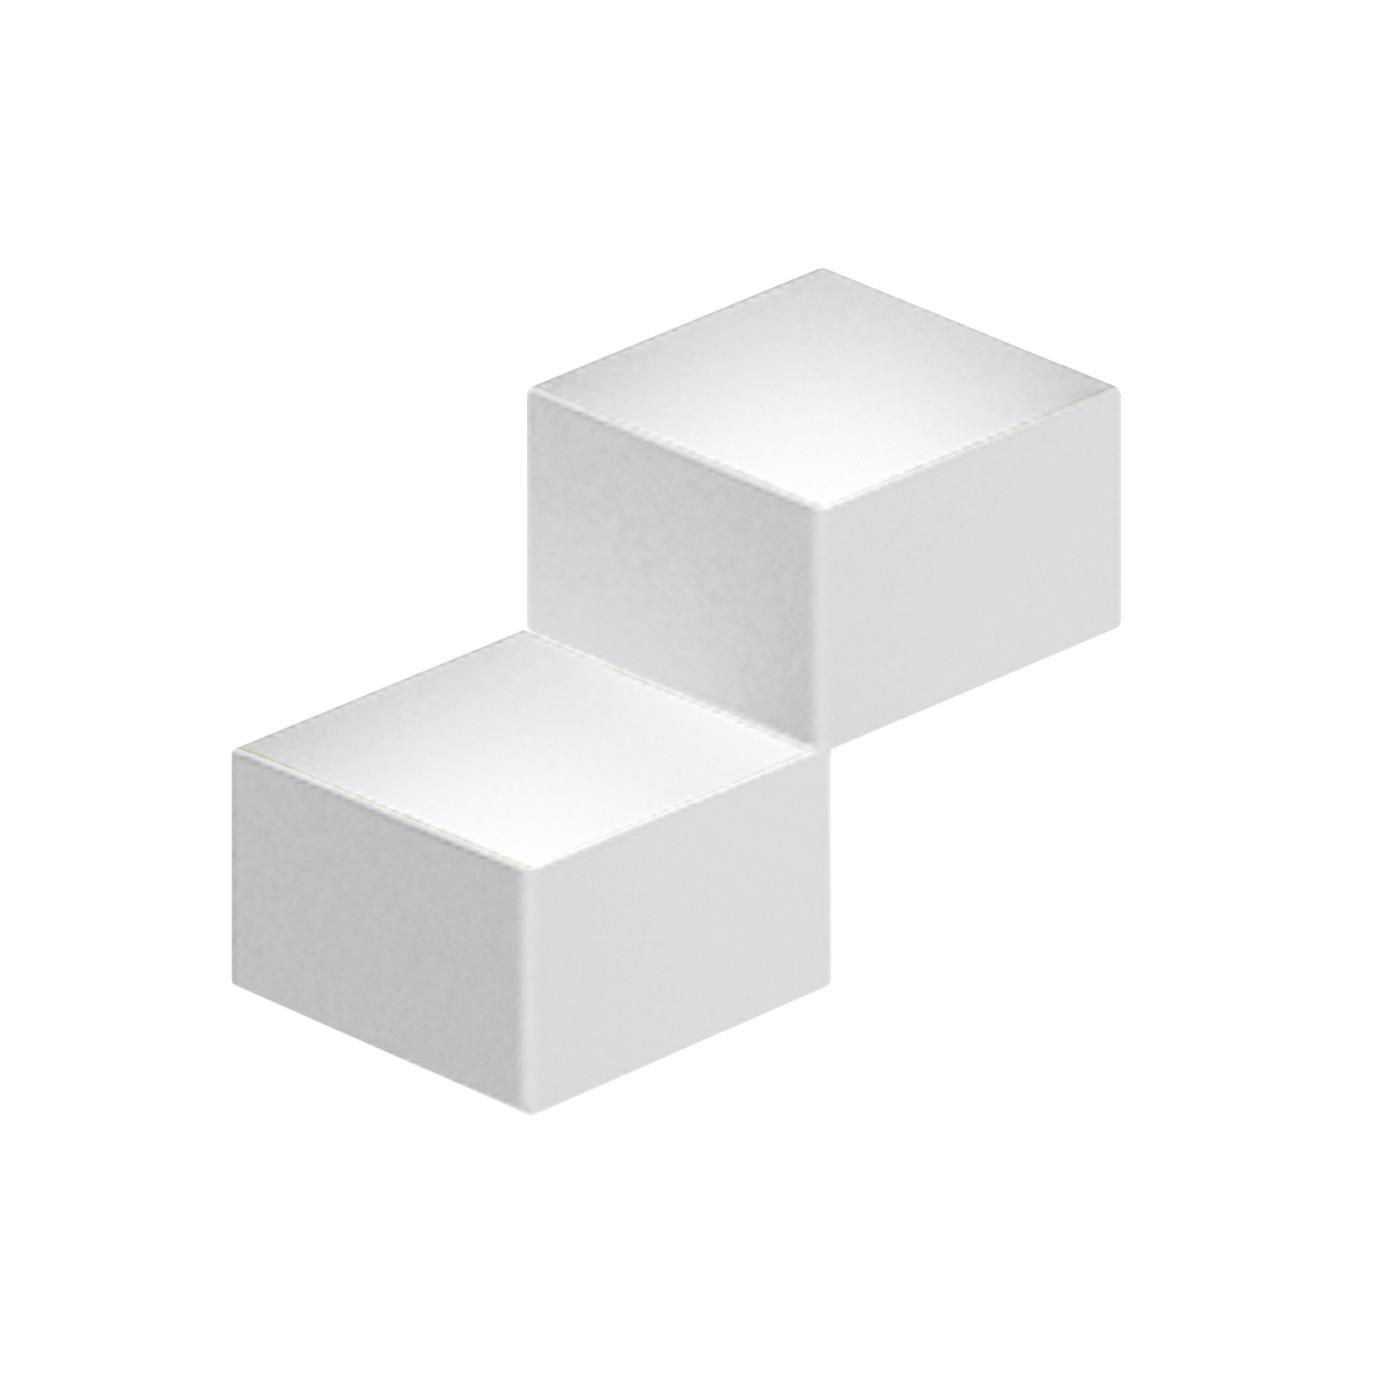 Vibia Fold Surface 4201